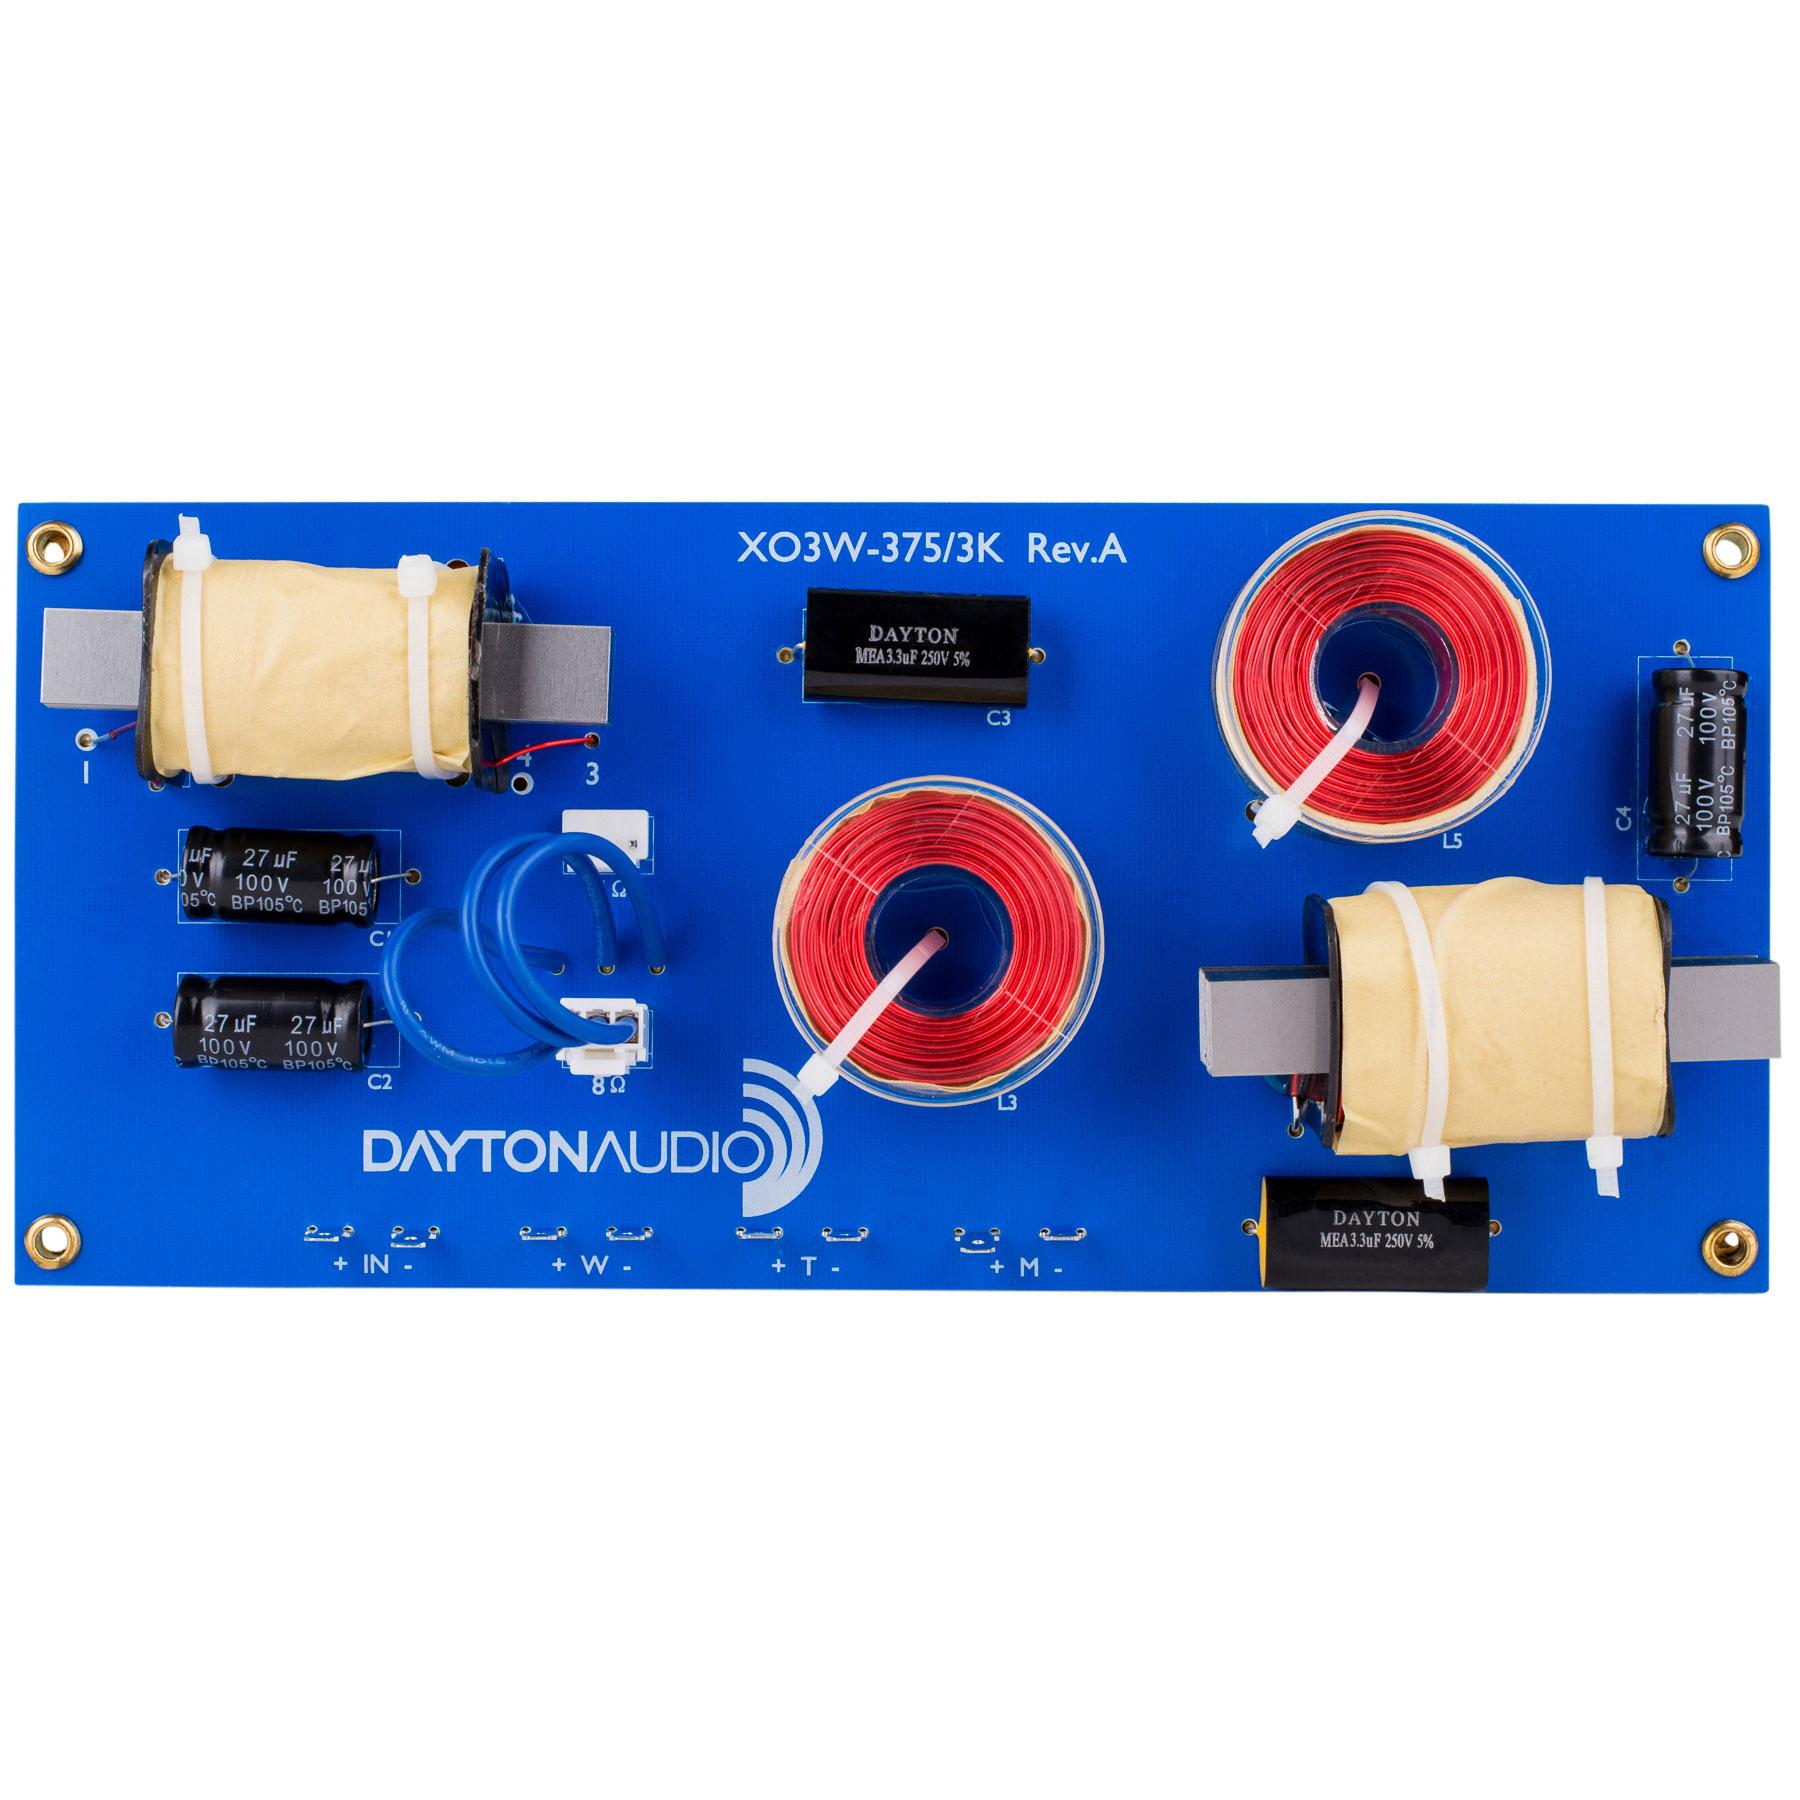 Dayton Audio XO3W-375/3K画像